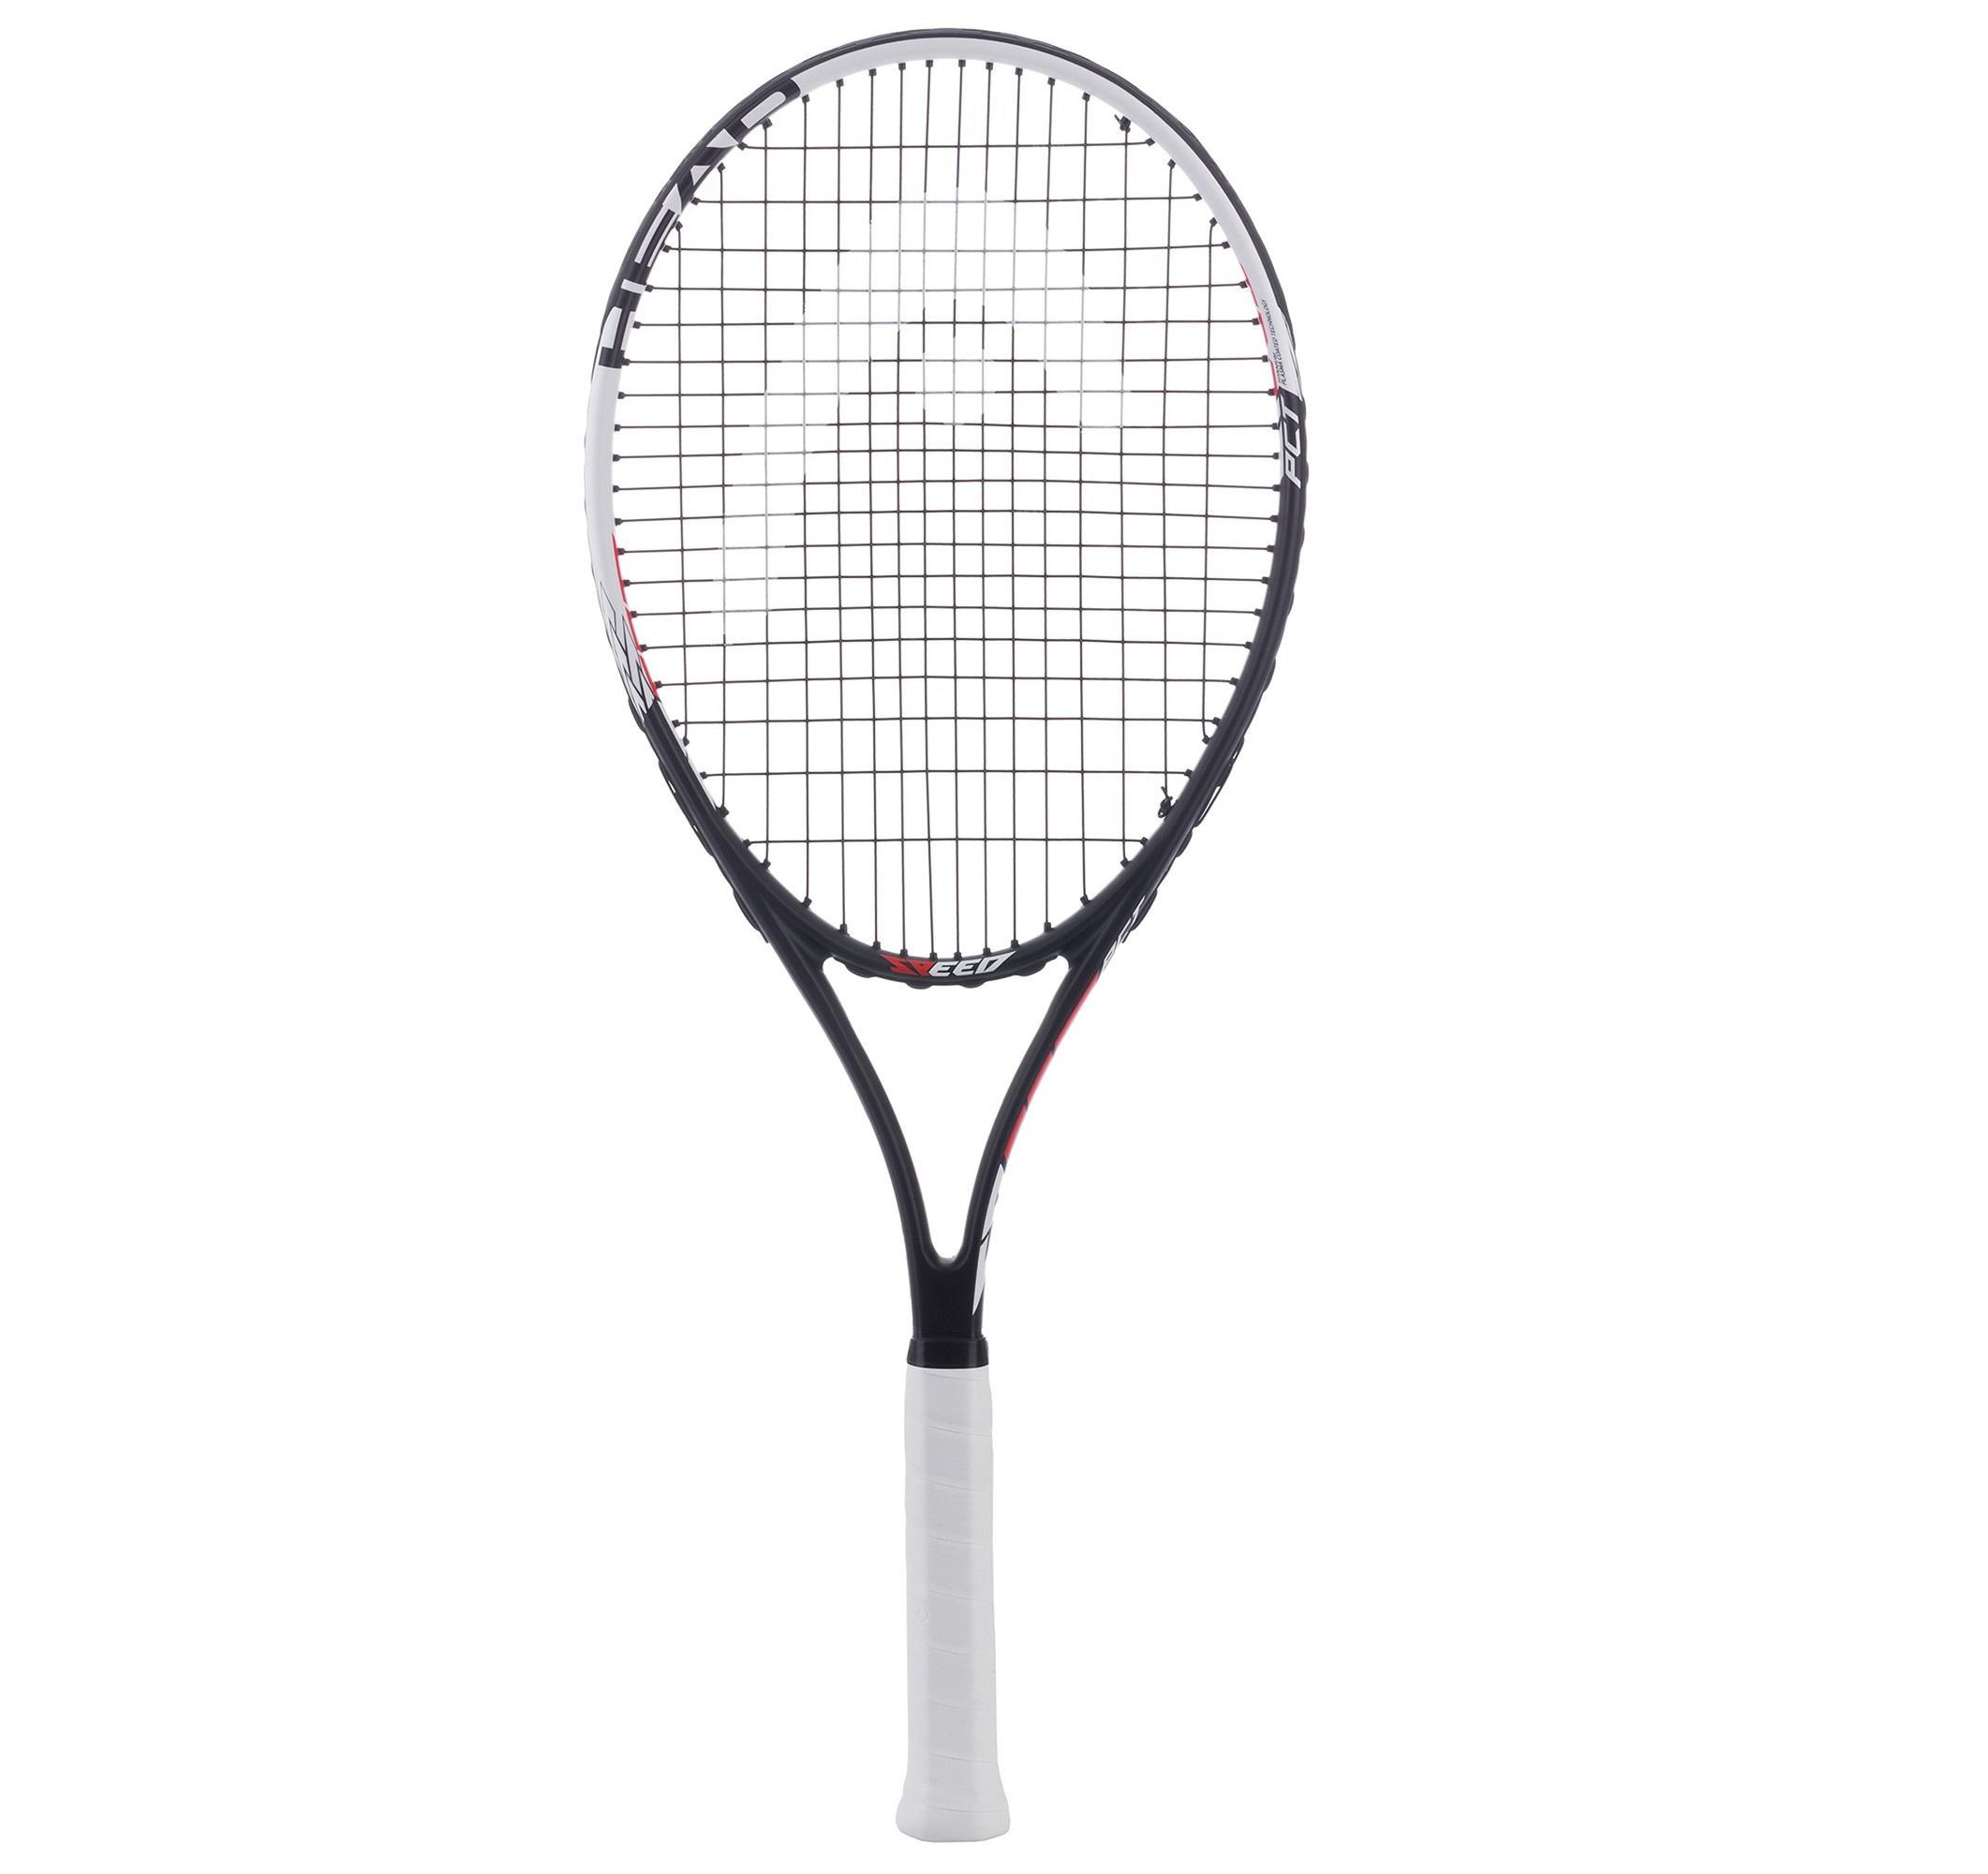 Head Ракетка для большого тенниса Head PCT Speed head ракетка для большого тенниса head graphene 360 speed lite 27